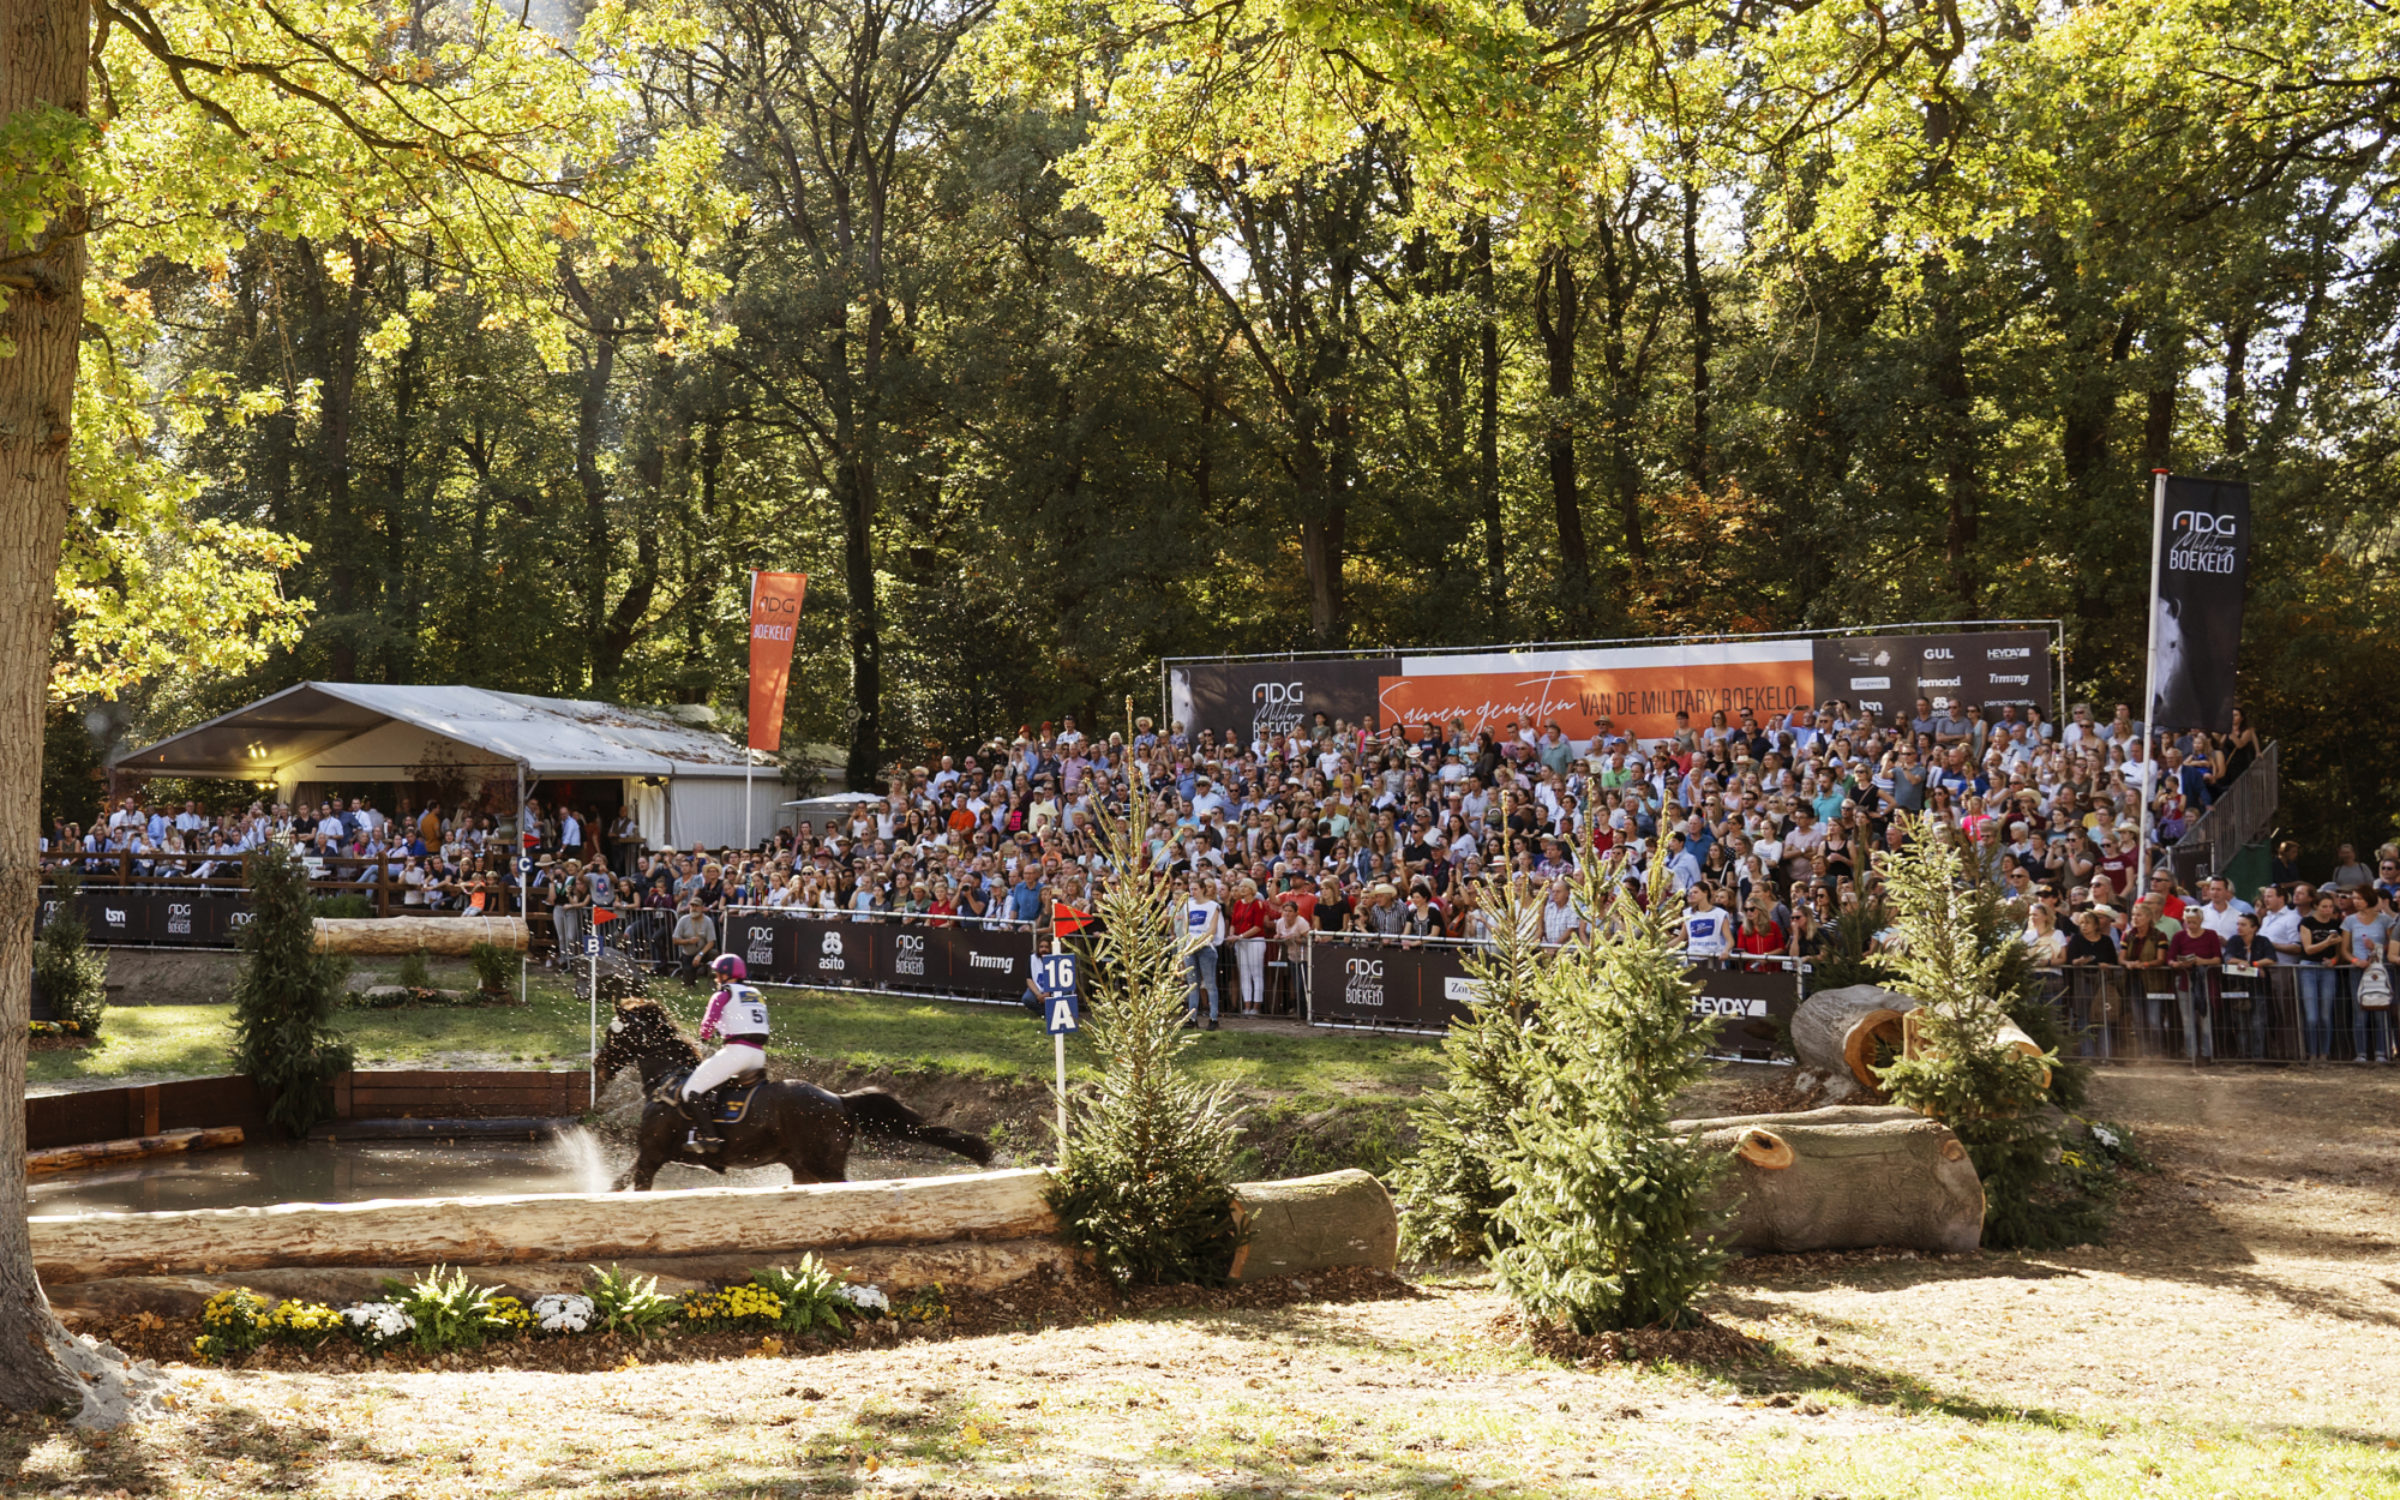 2018 Ebo Fraterman Military Boekelo Enschede Evenementen 6